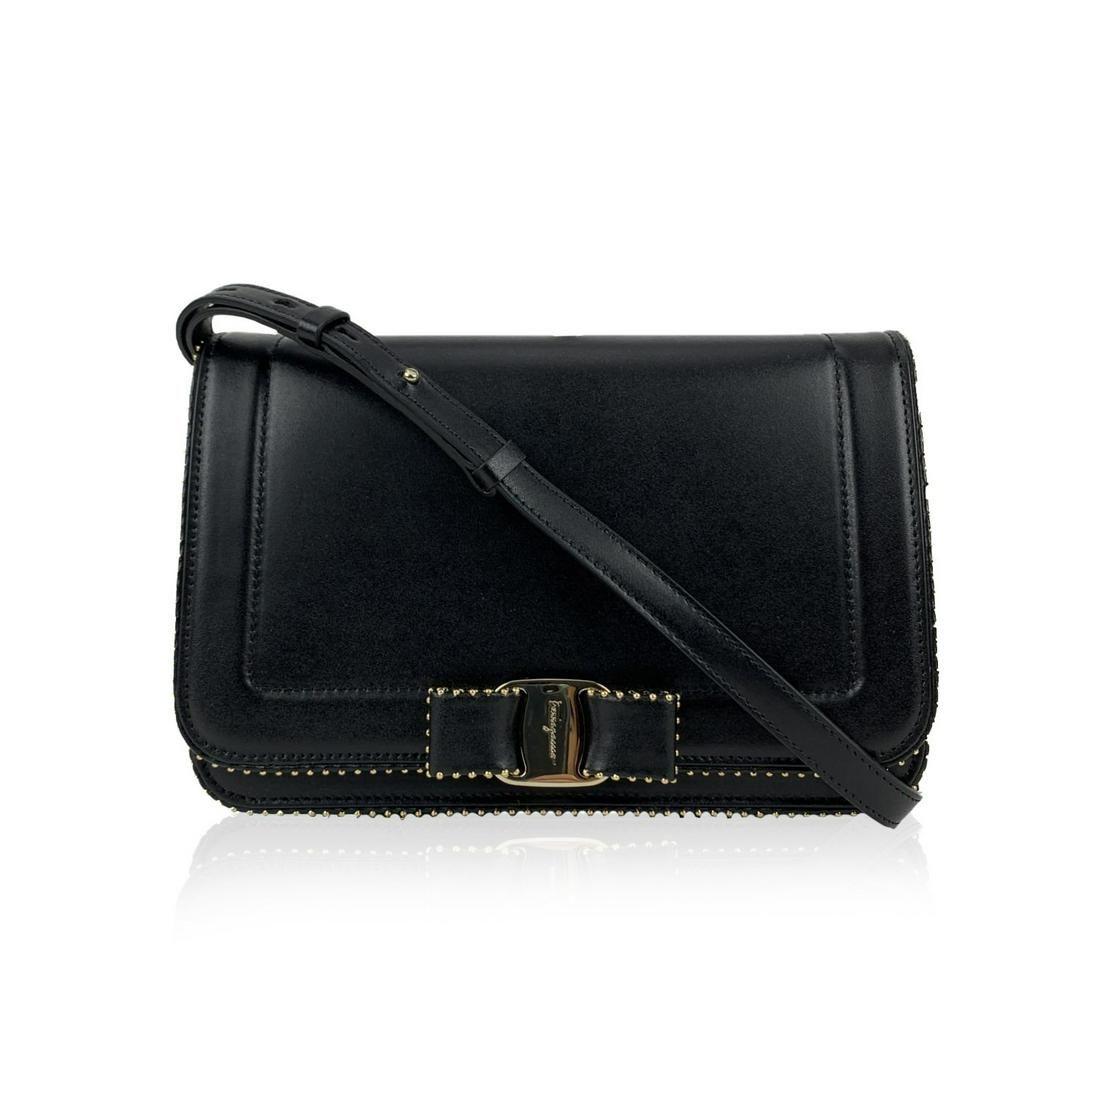 Salvatore Ferragamo Black Leather Vara RW Bow Flap Mint